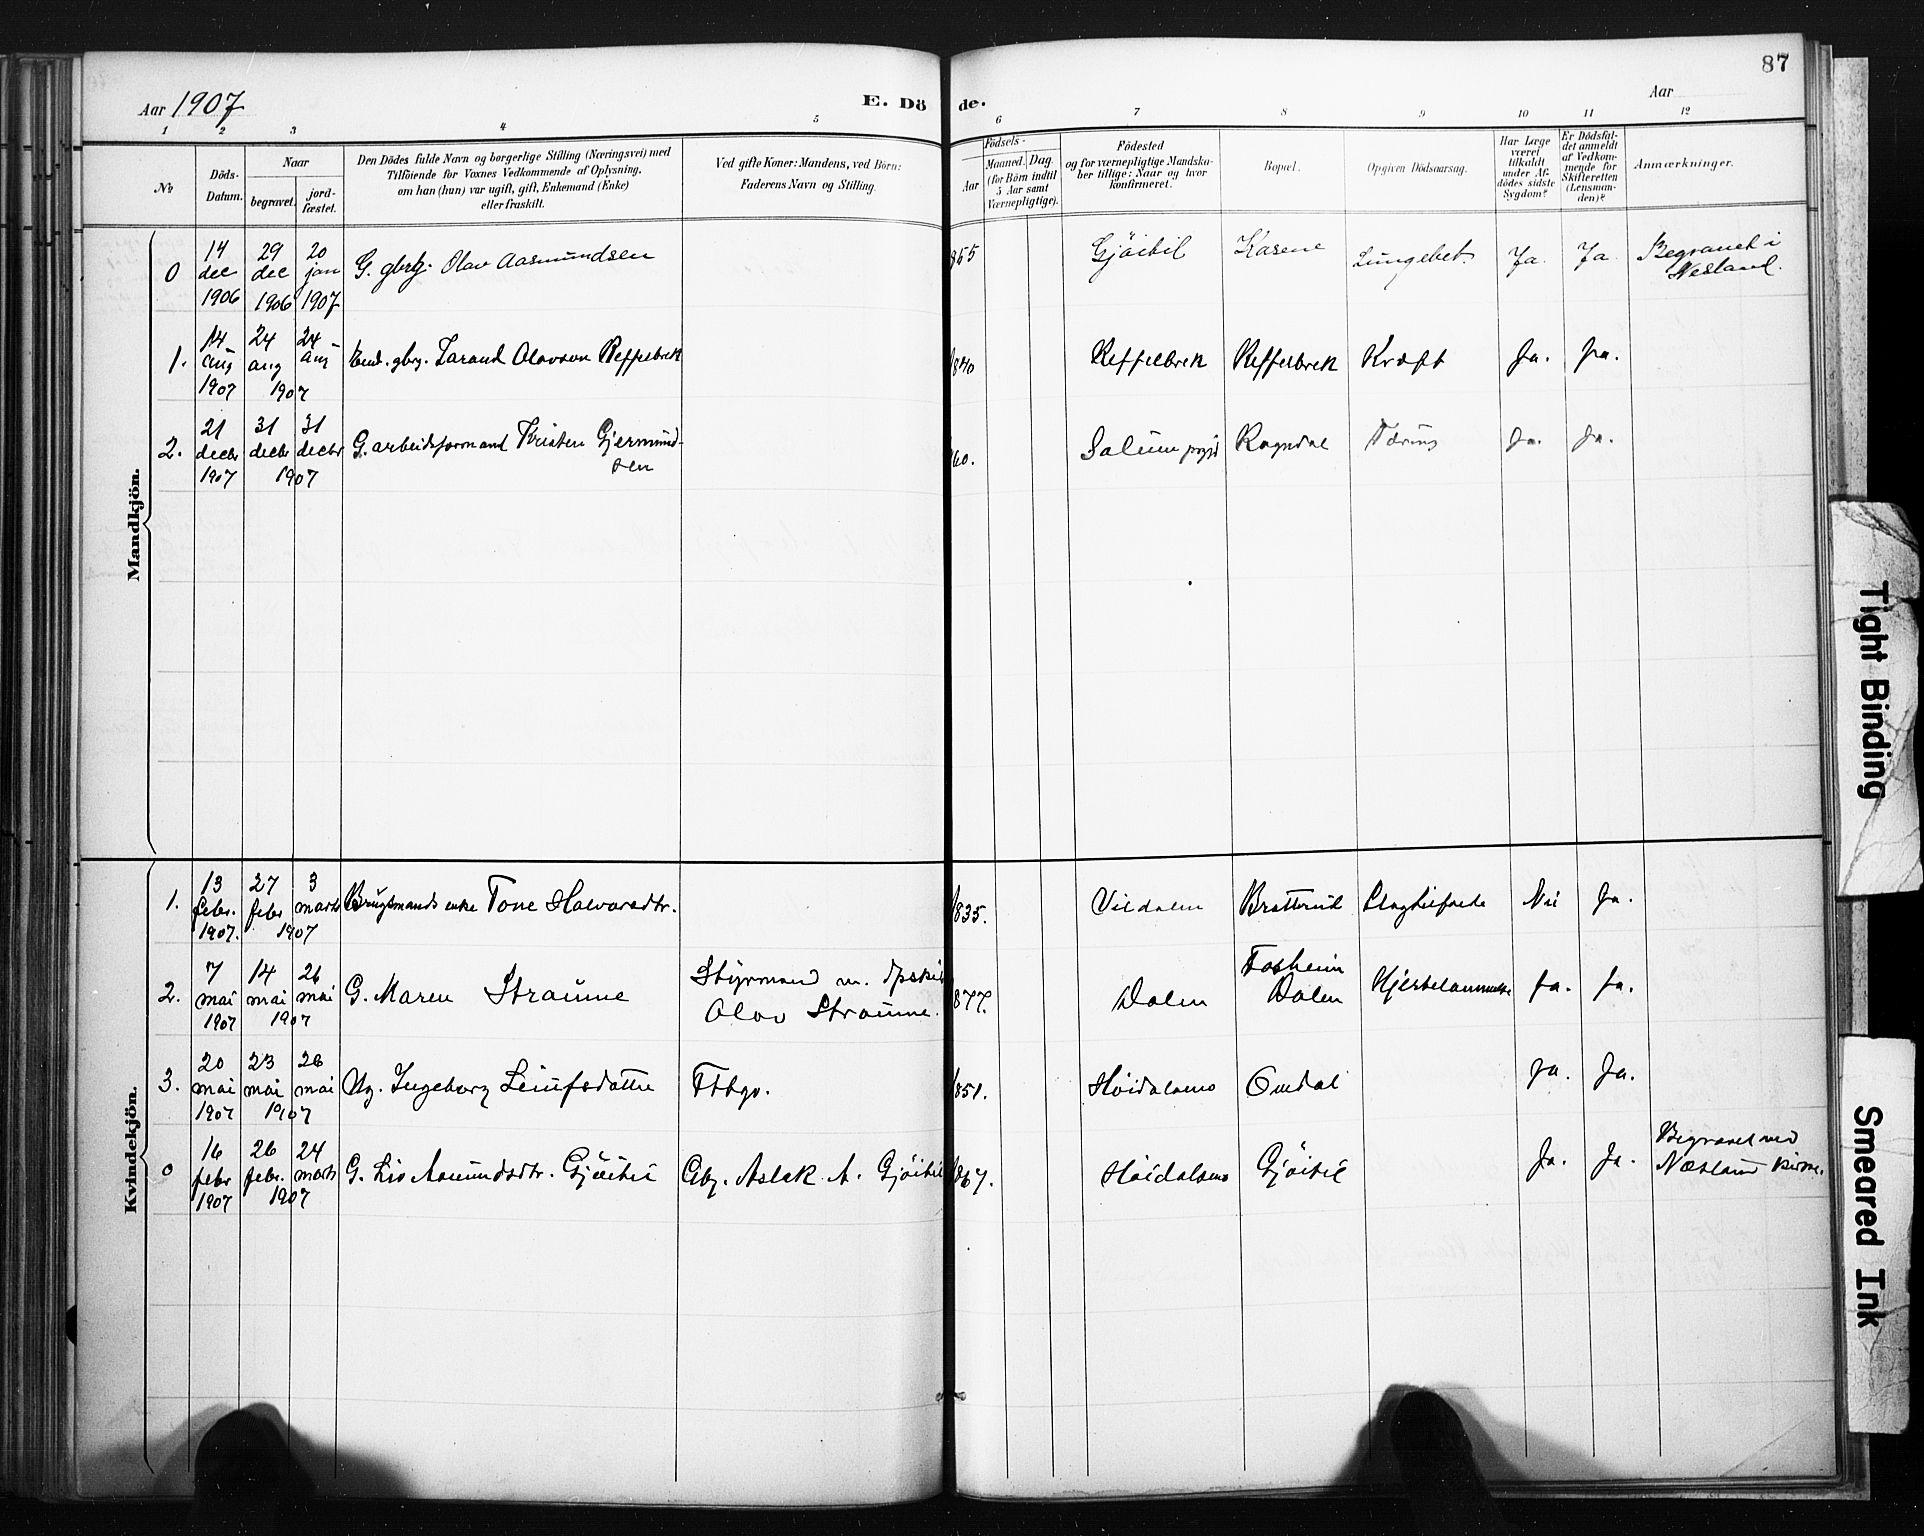 SAKO, Lårdal kirkebøker, F/Fb/L0002: Ministerialbok nr. II 2, 1887-1918, s. 87